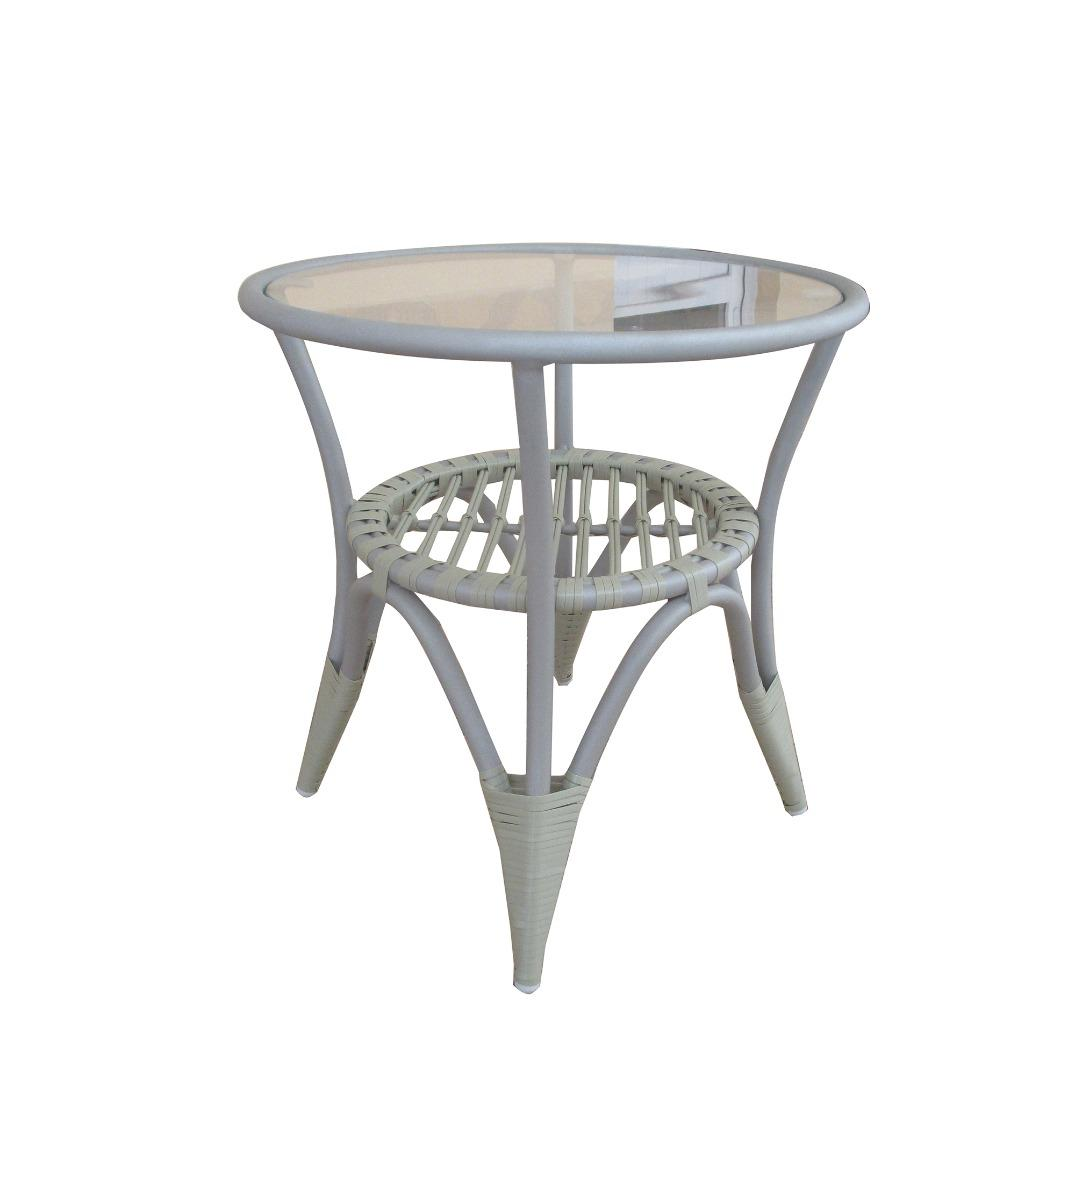 Tahiti lounge round table 50x50x52cm